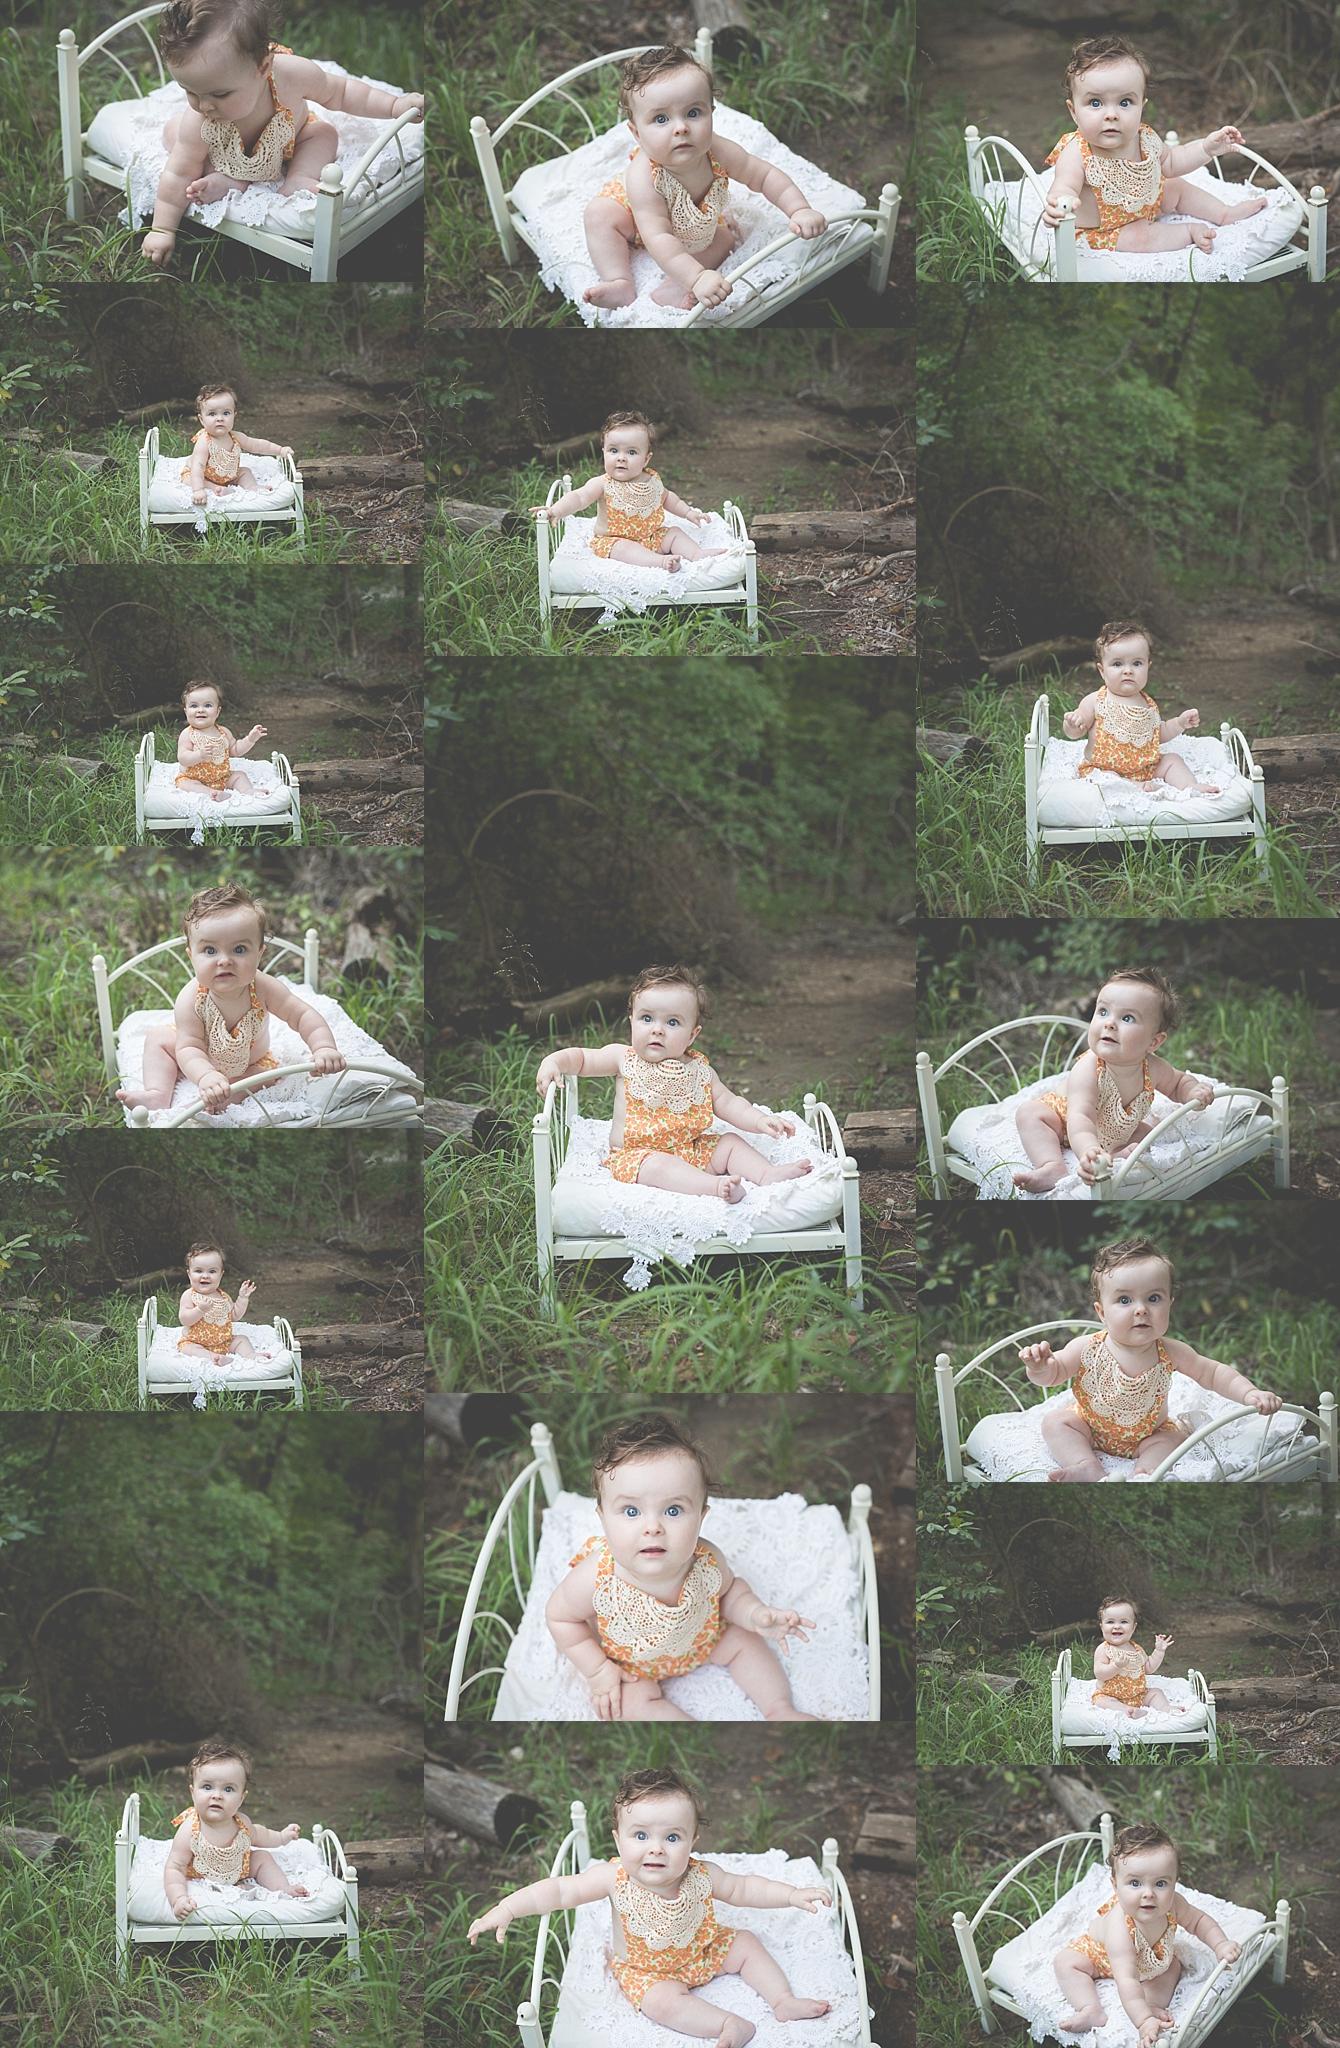 08-23-17lake ozarks missouri family baby outdoor photography mini session5.jpg